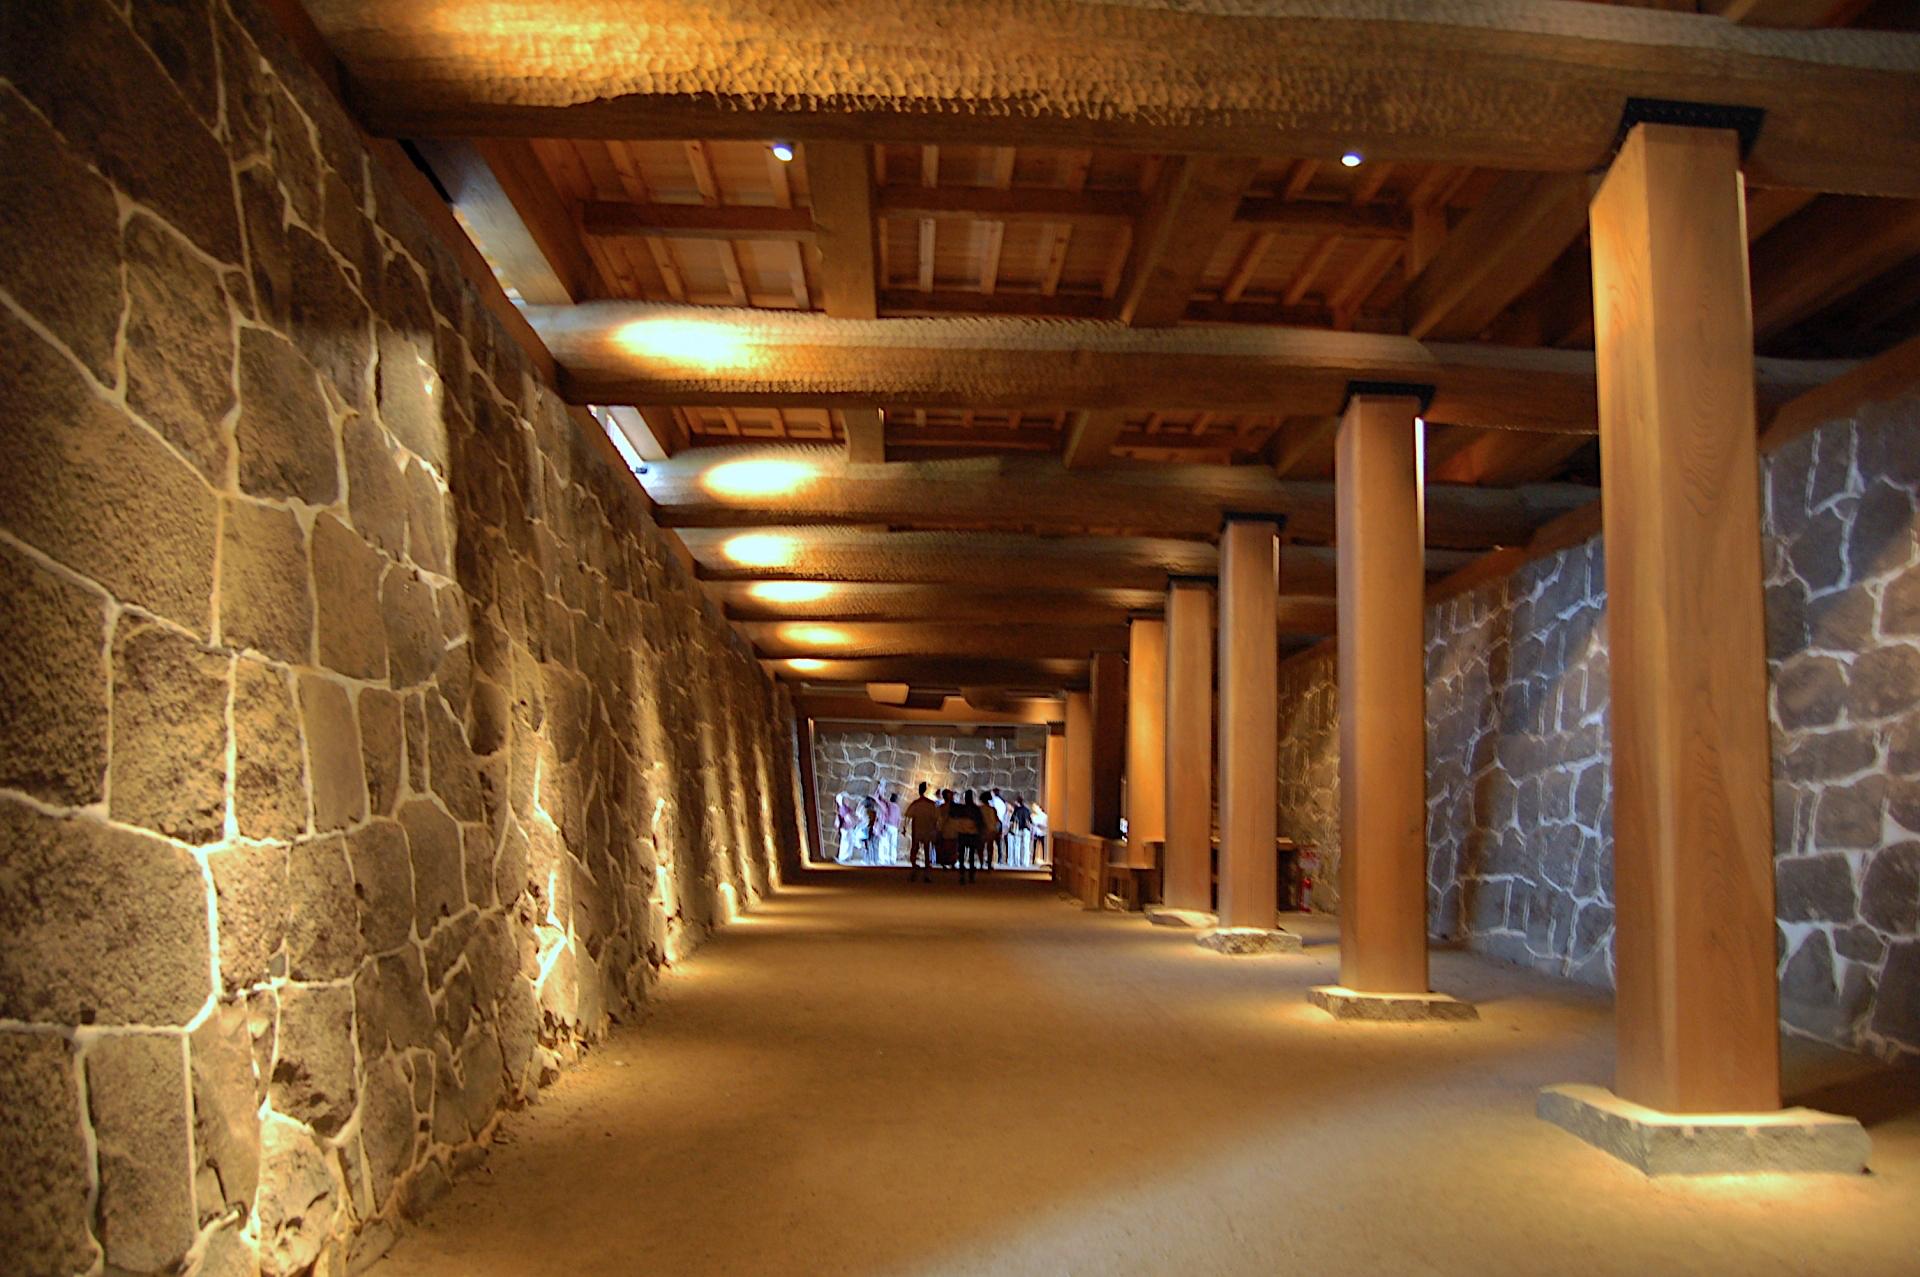 熊本城・闇り通路